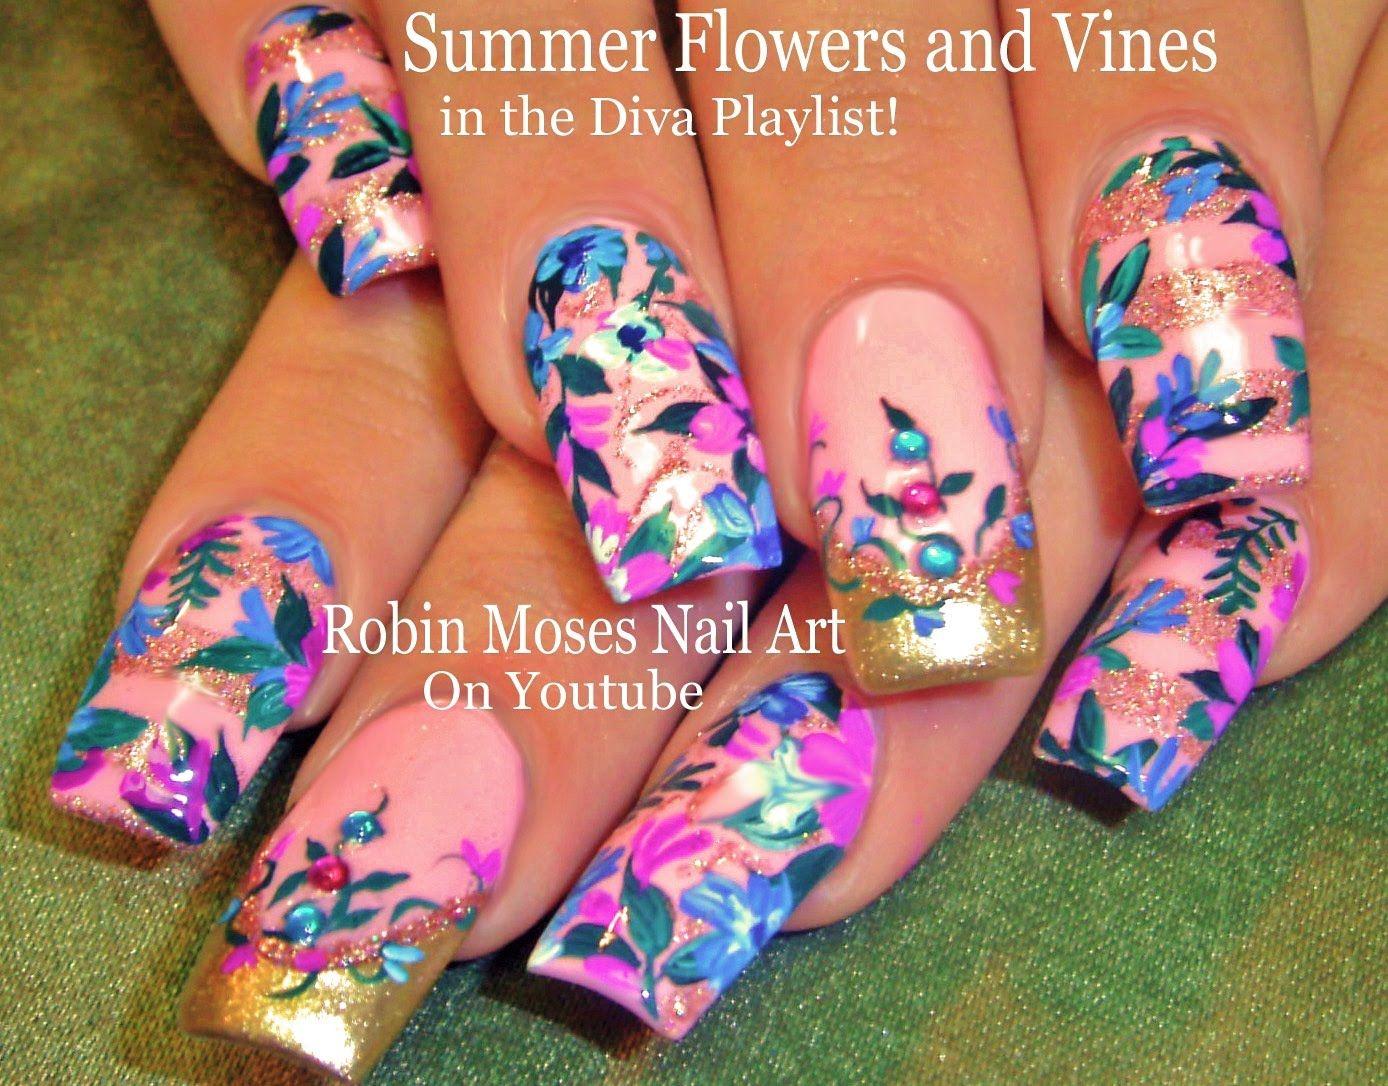 Nail Art Diy Pink Flower Nails Diva Floral Nail Design Tutorial